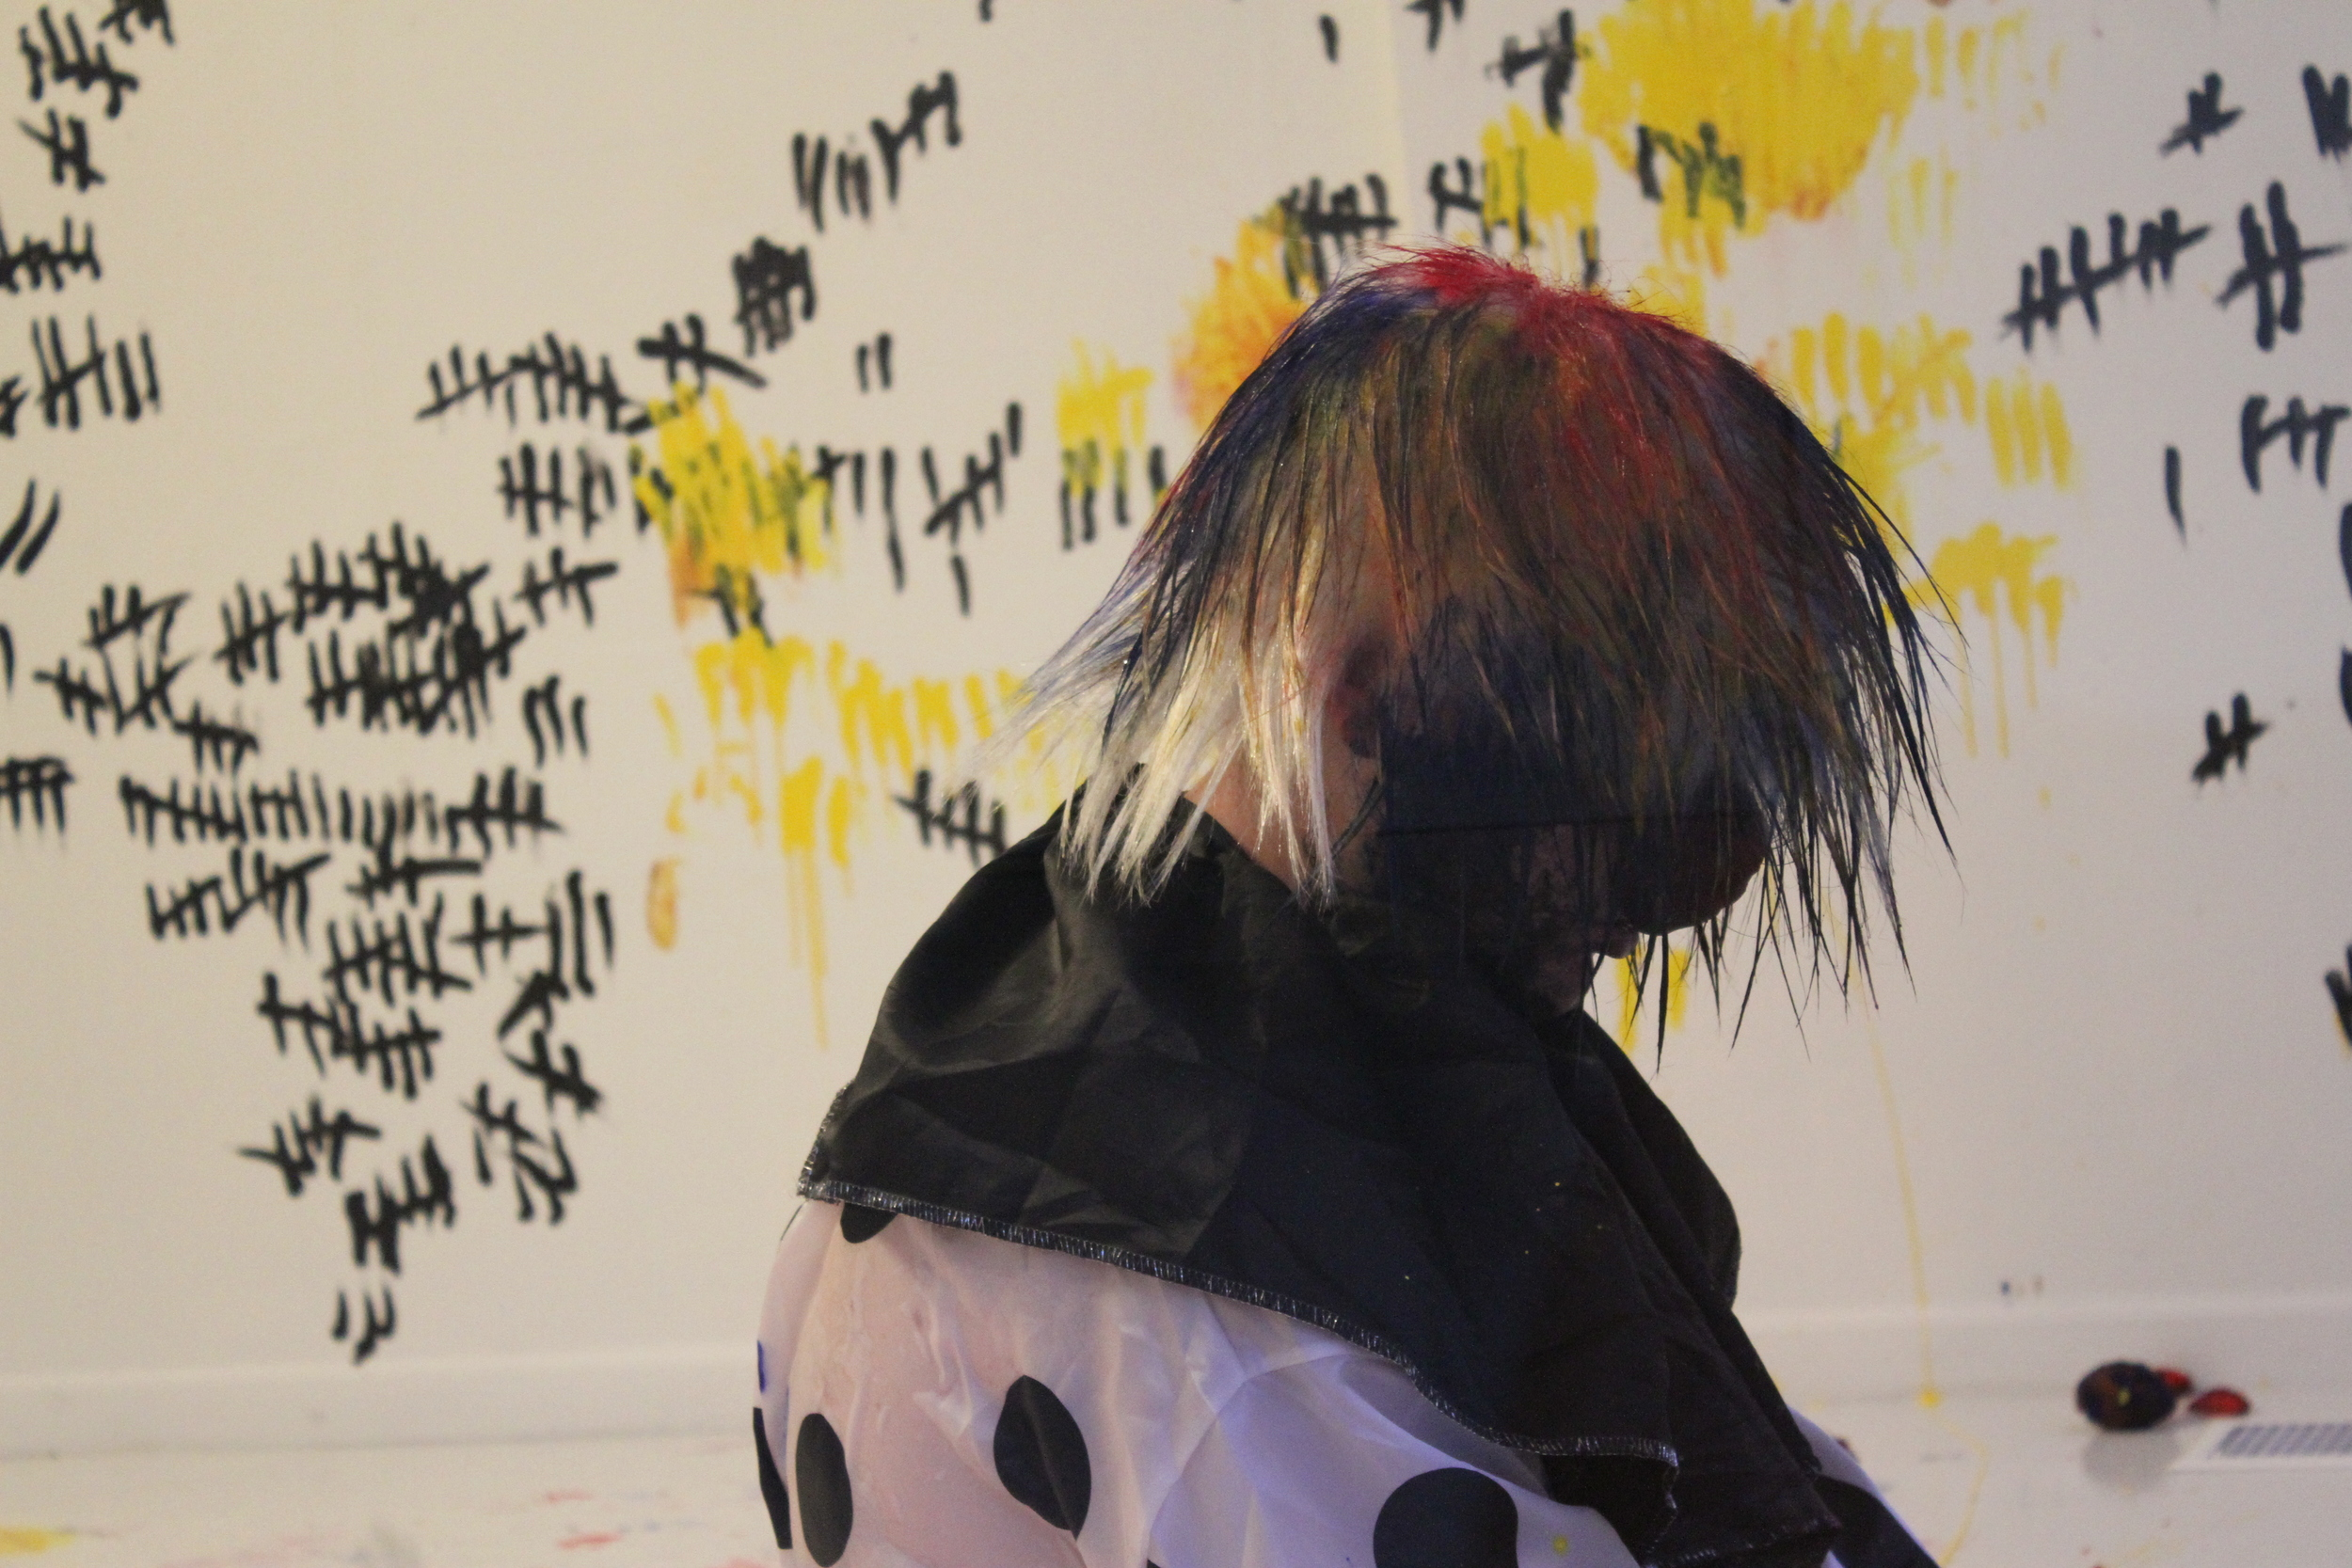 20150829_The Forbidden Experiment (Truffles)_PhotoCredit_Toni140.JPG